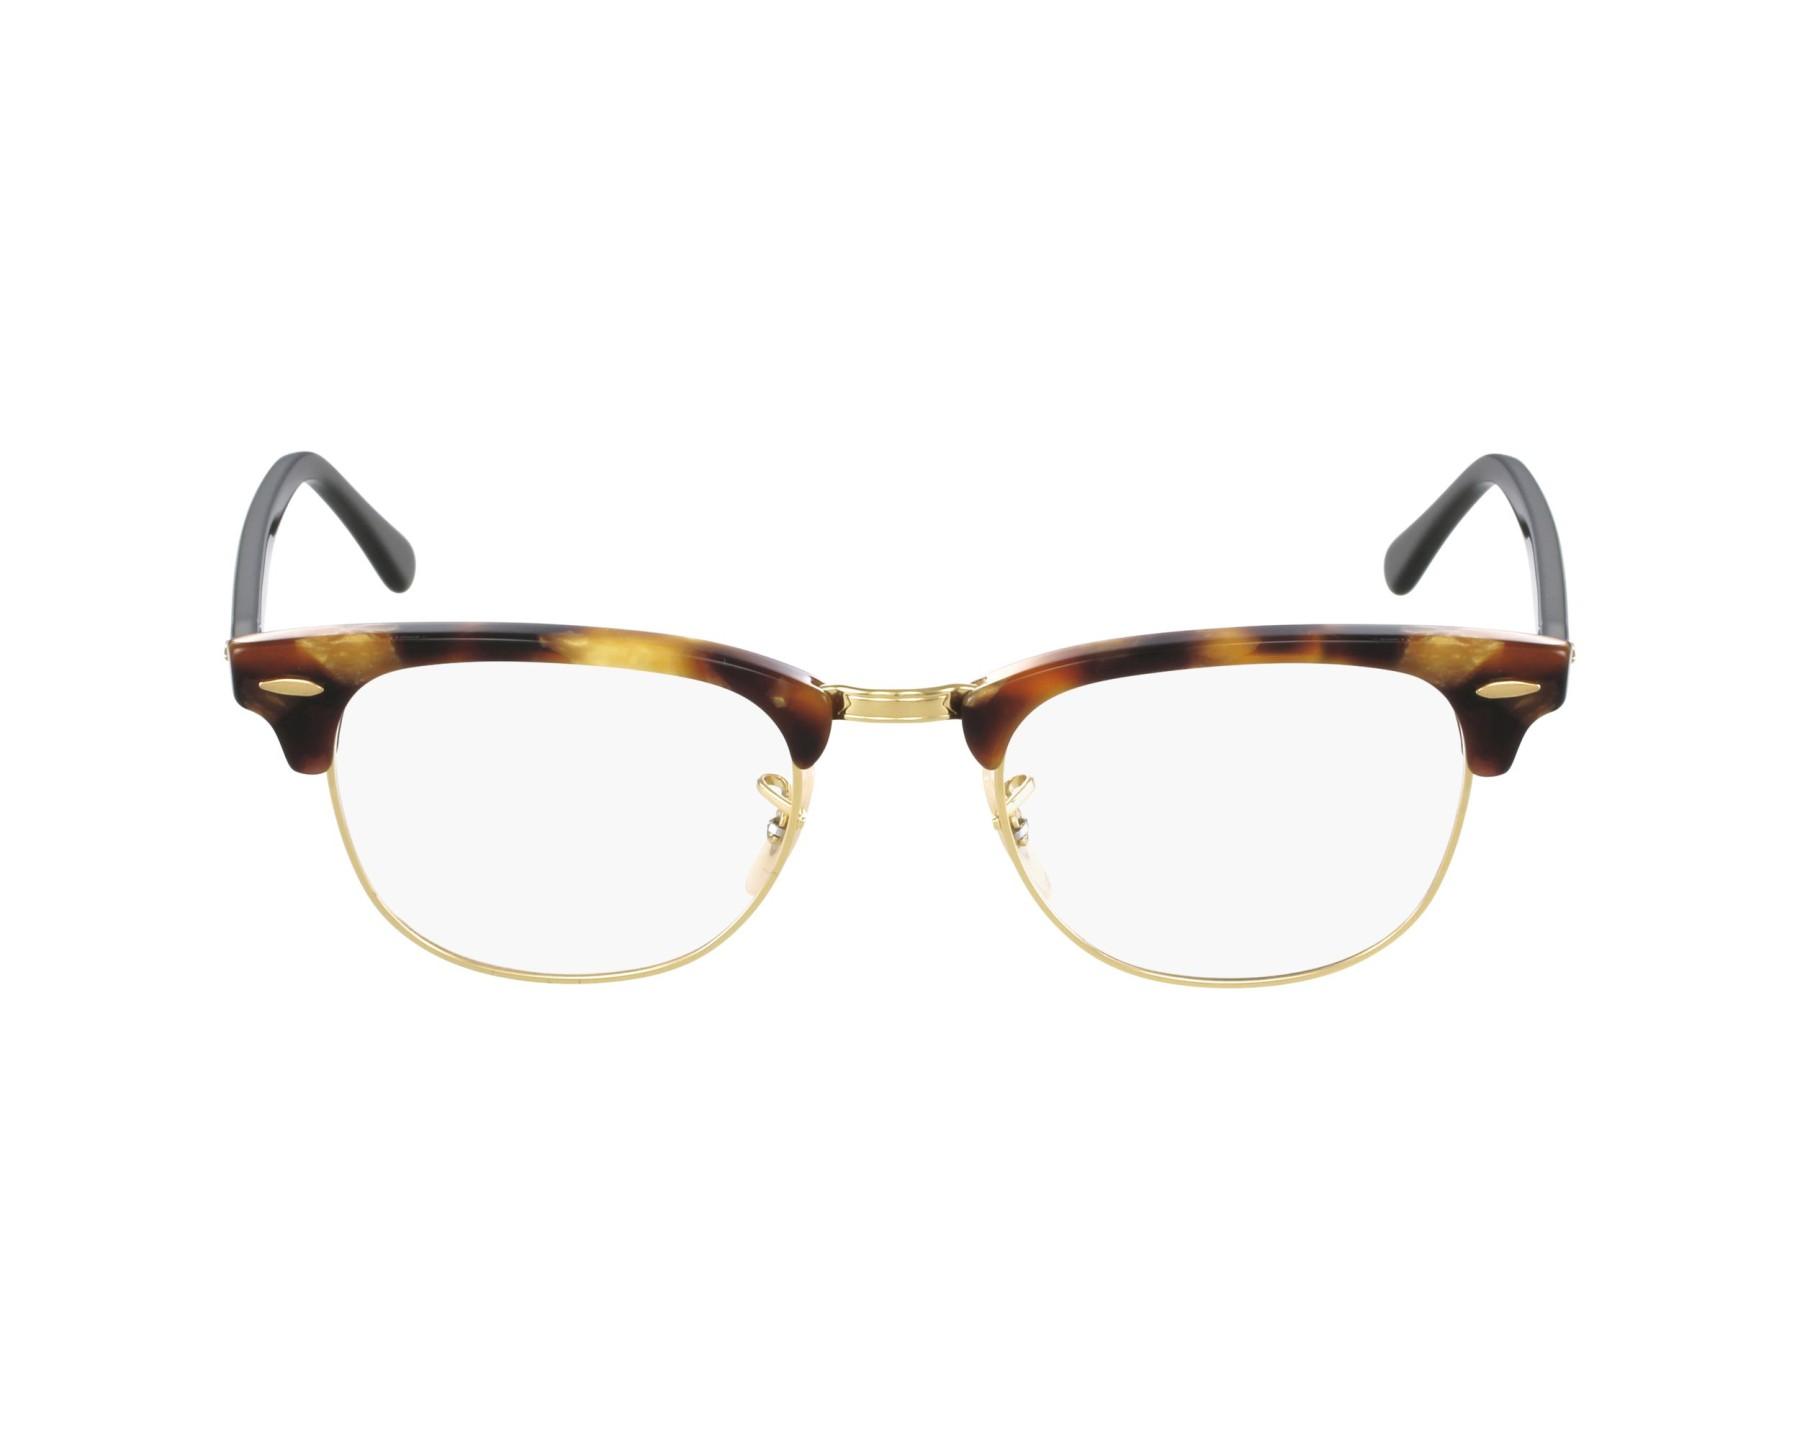 Ray Ban Eyeglasses Rx Havana